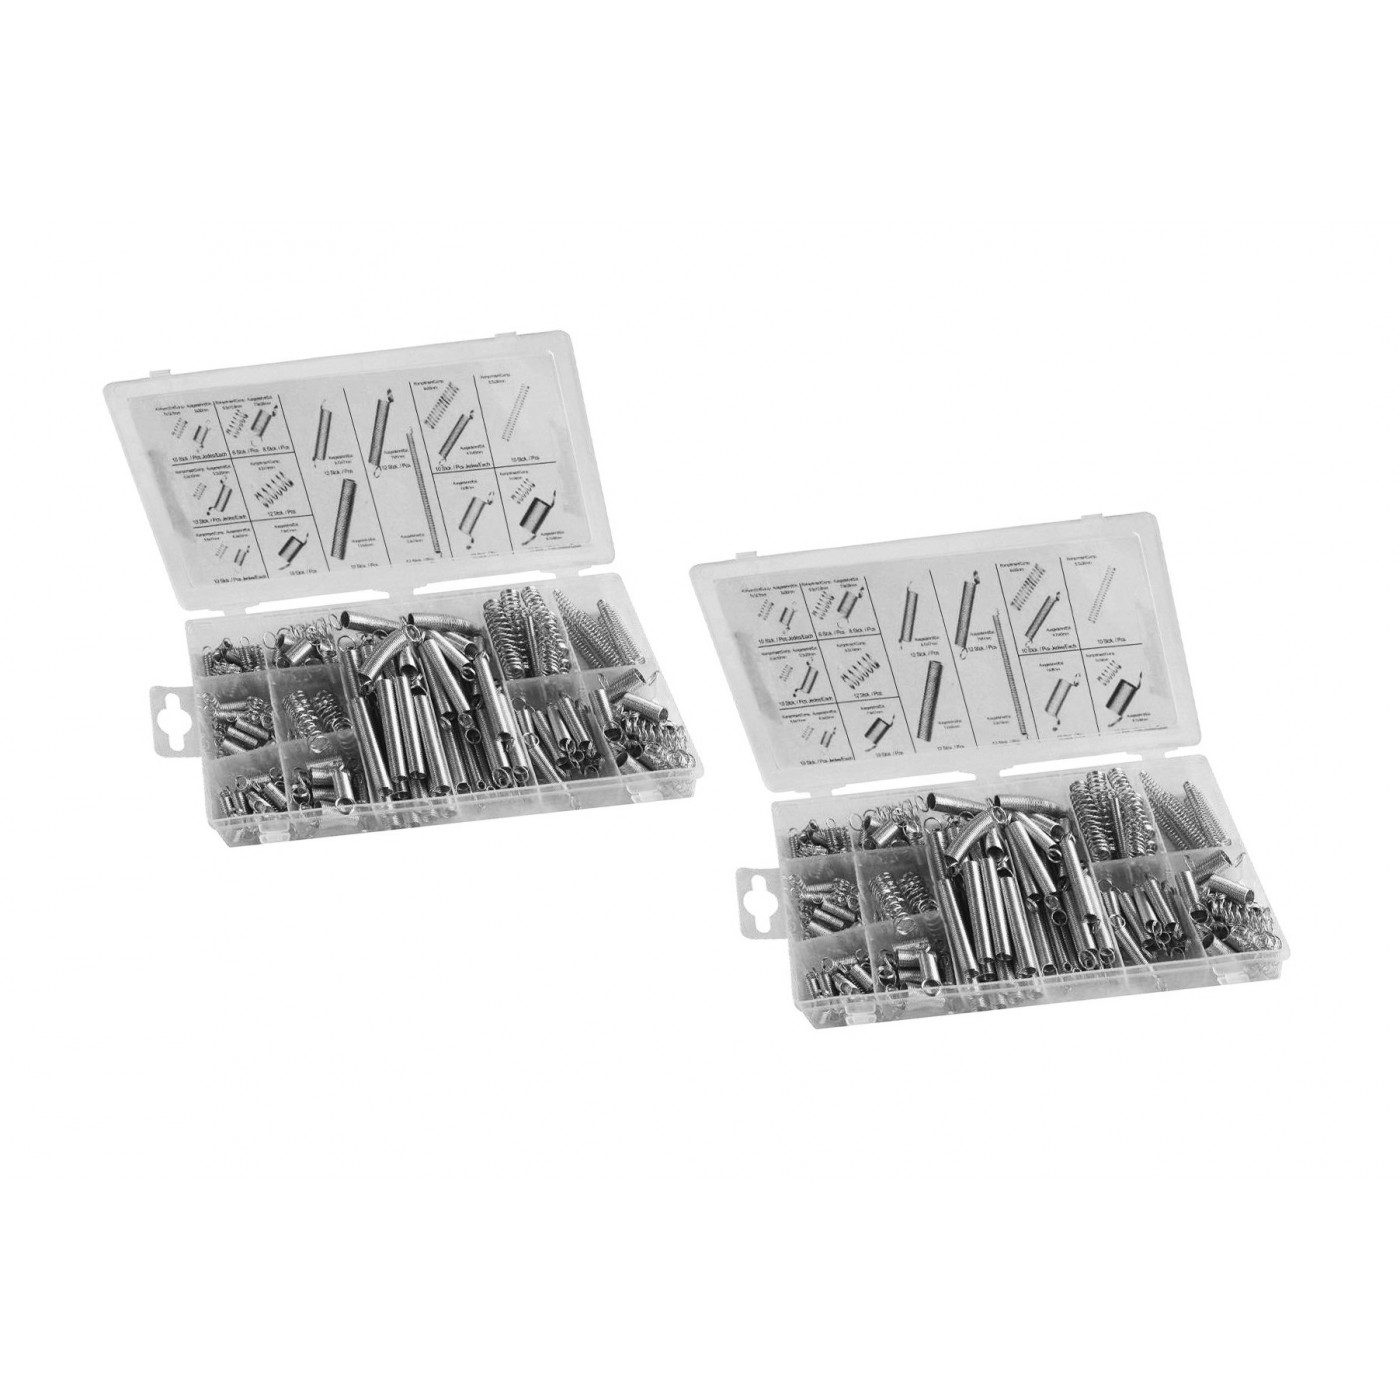 Ensemble de 400 ressorts de tension et de compression (2 boîtes)